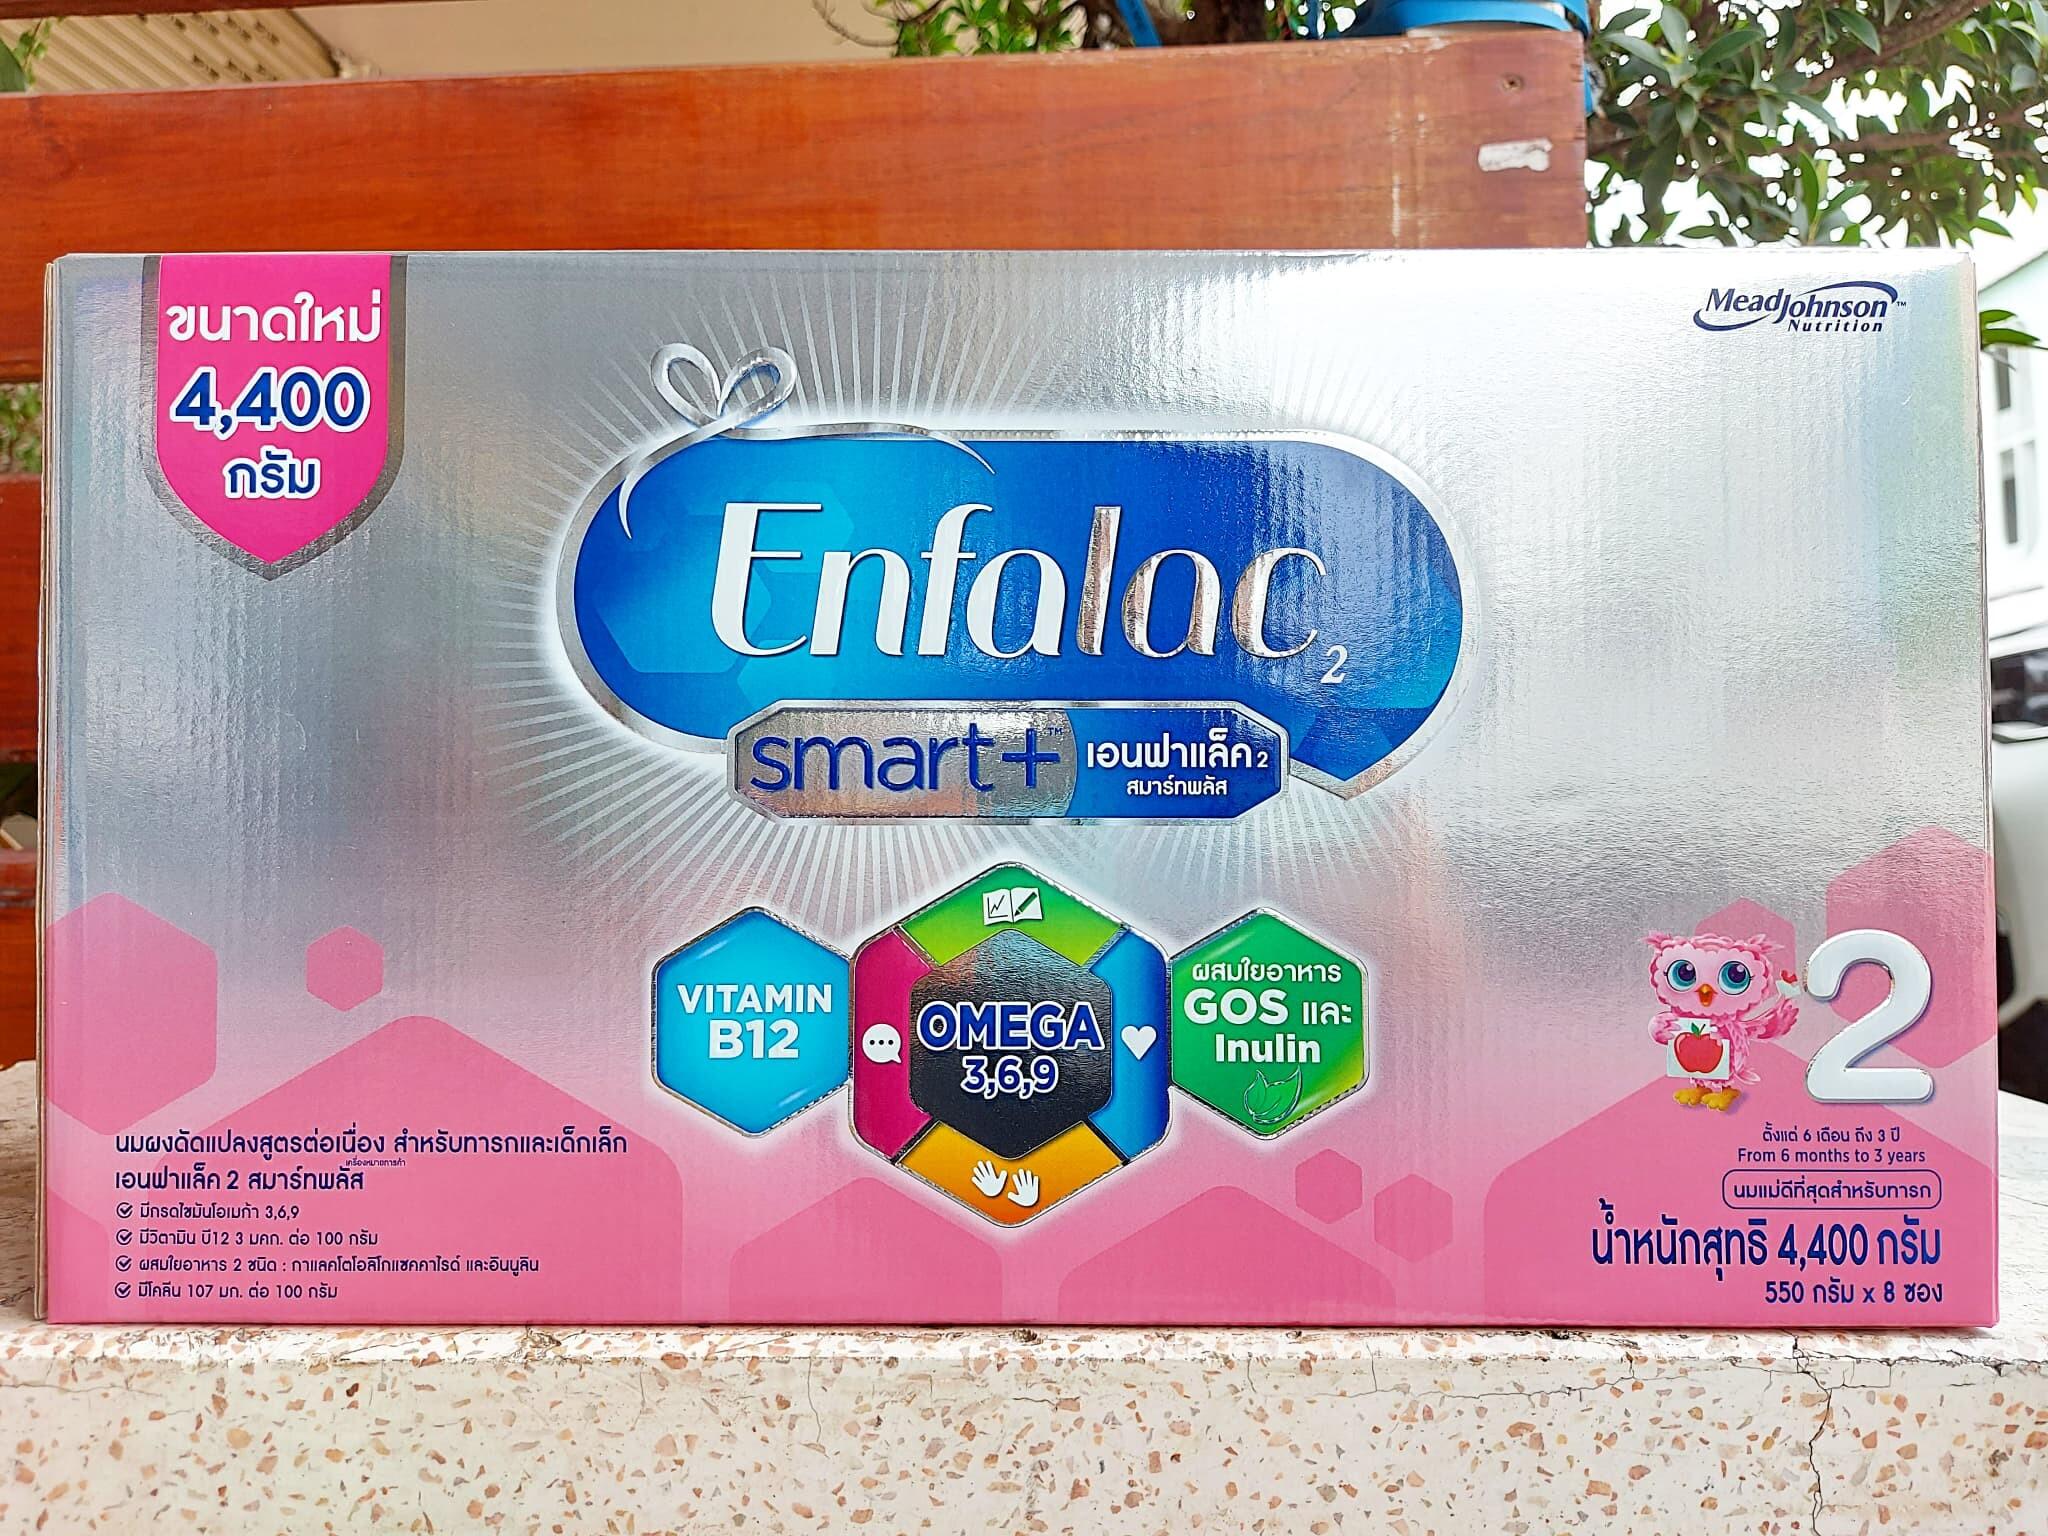 Enfalac Smart + สูตร 2 (4,400) ยกกล่อง มี 8 ถุง